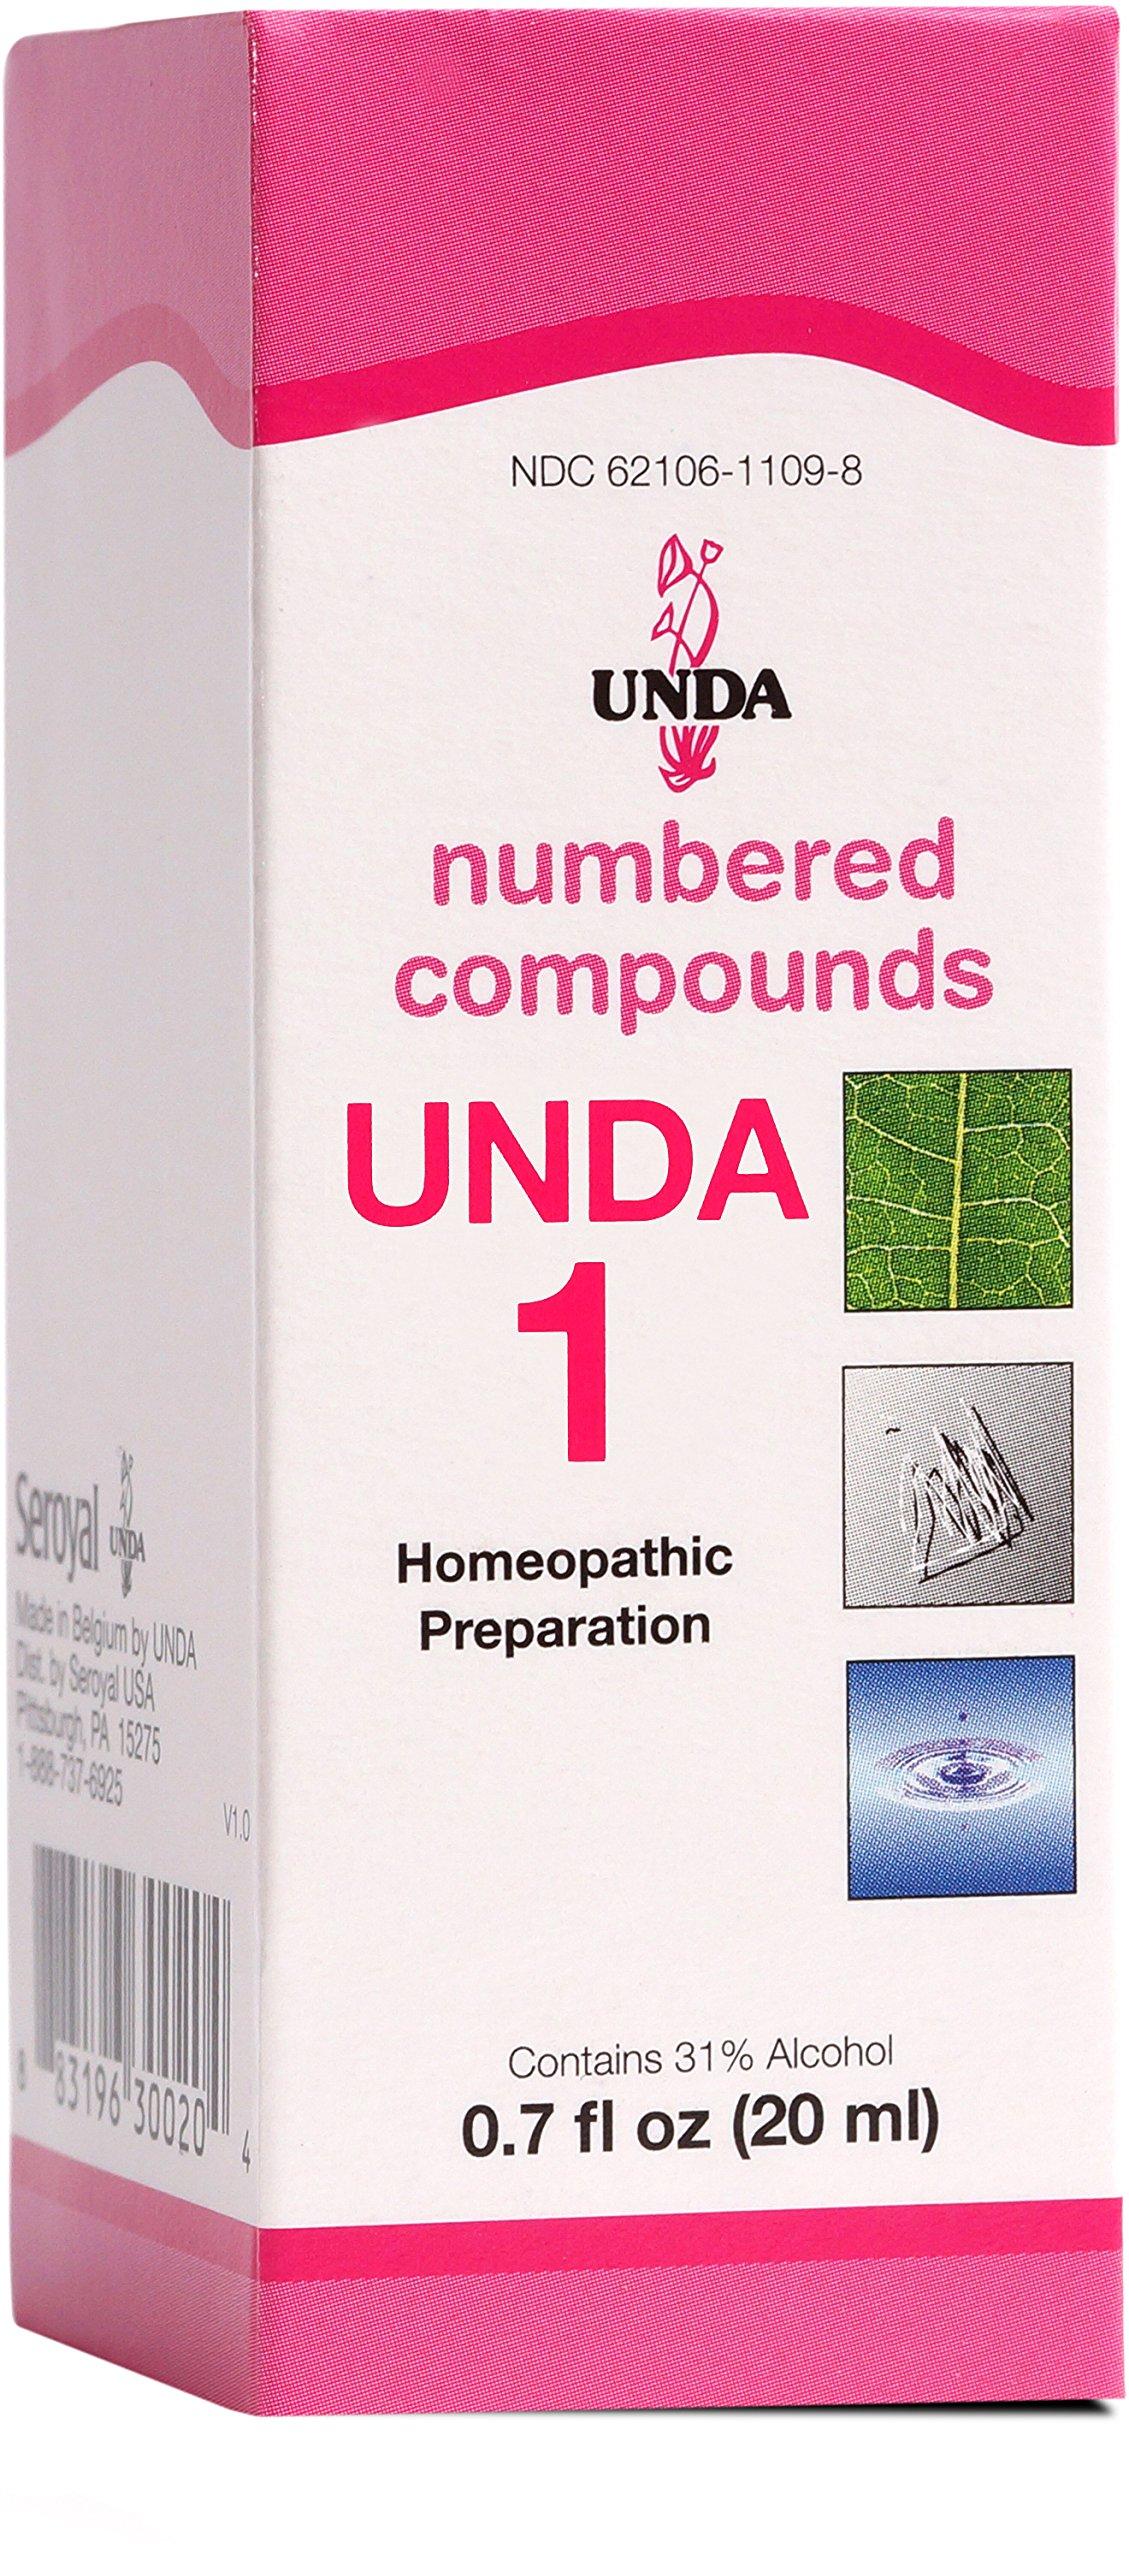 UNDA - UNDA 1 Numbered Compounds - Homeopathic Preparation - 0.7 fl oz (20 ml) by UNDA